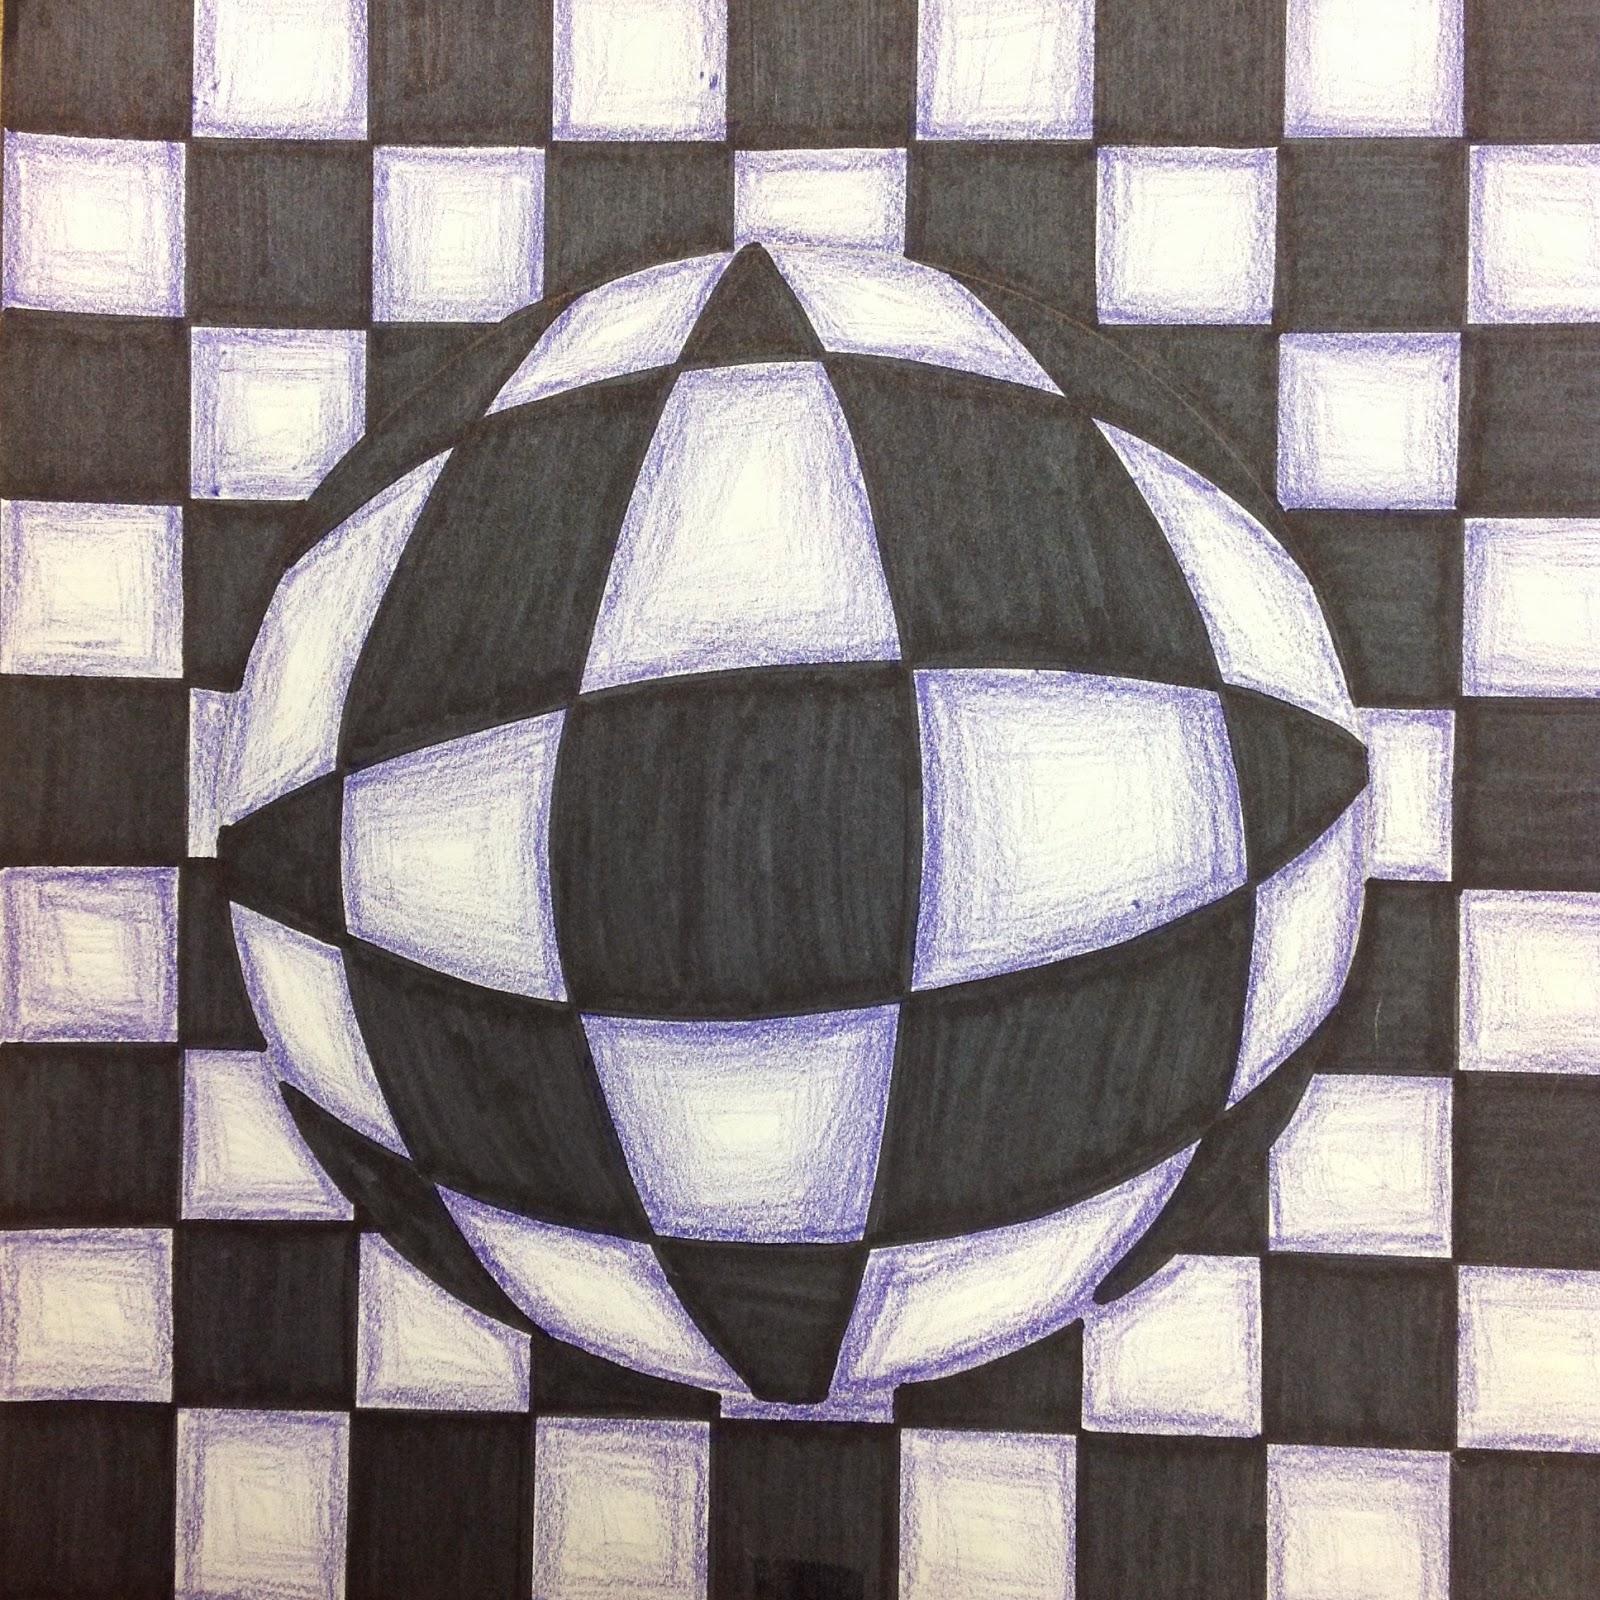 Drawn optical illusion optical design Optical Pants: Optical Miss Lesson